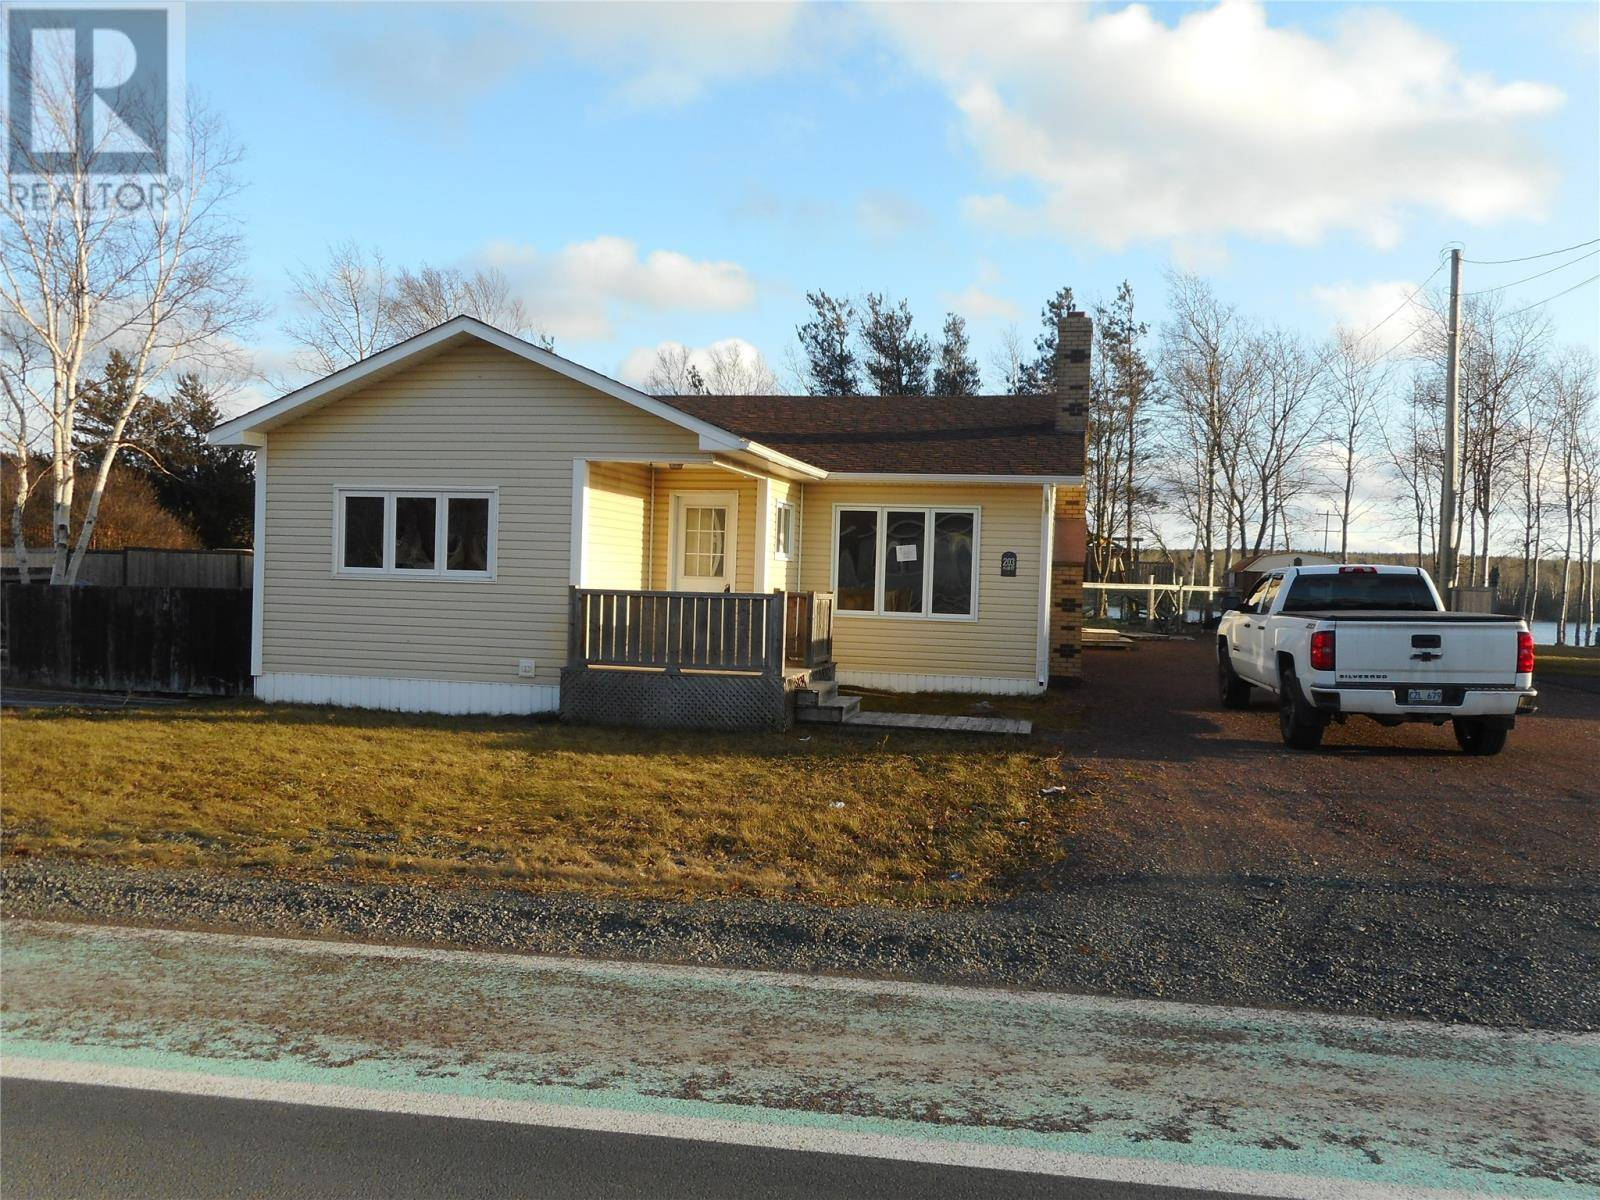 House for sale at 203 Main St Bishops Falls Newfoundland - MLS: 1209080